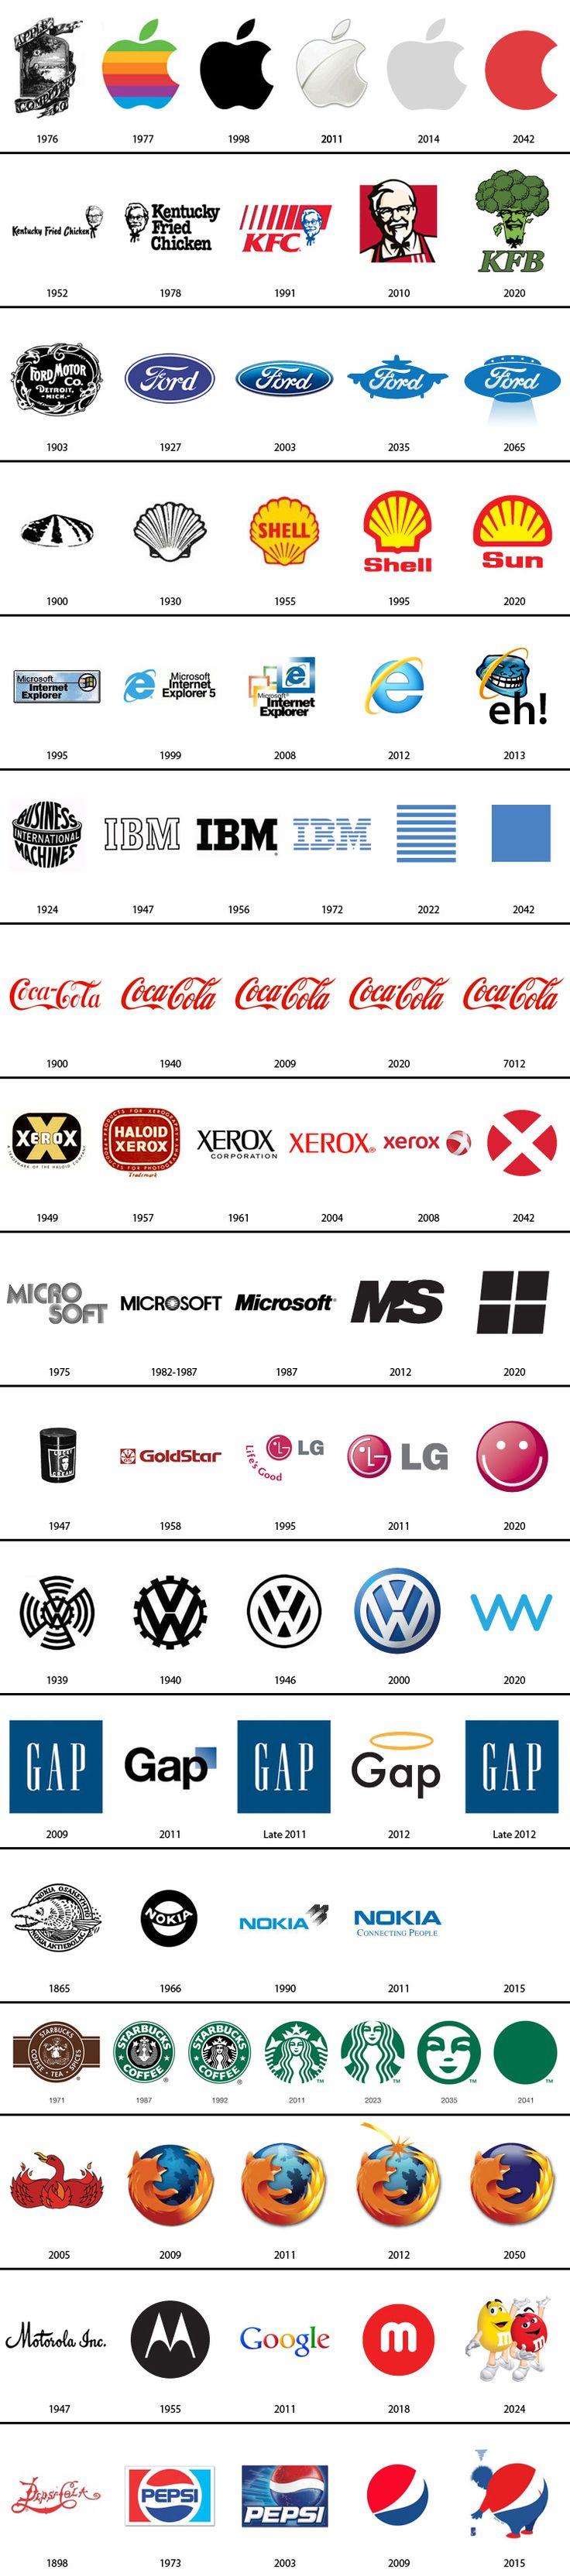 The evolution of logos.